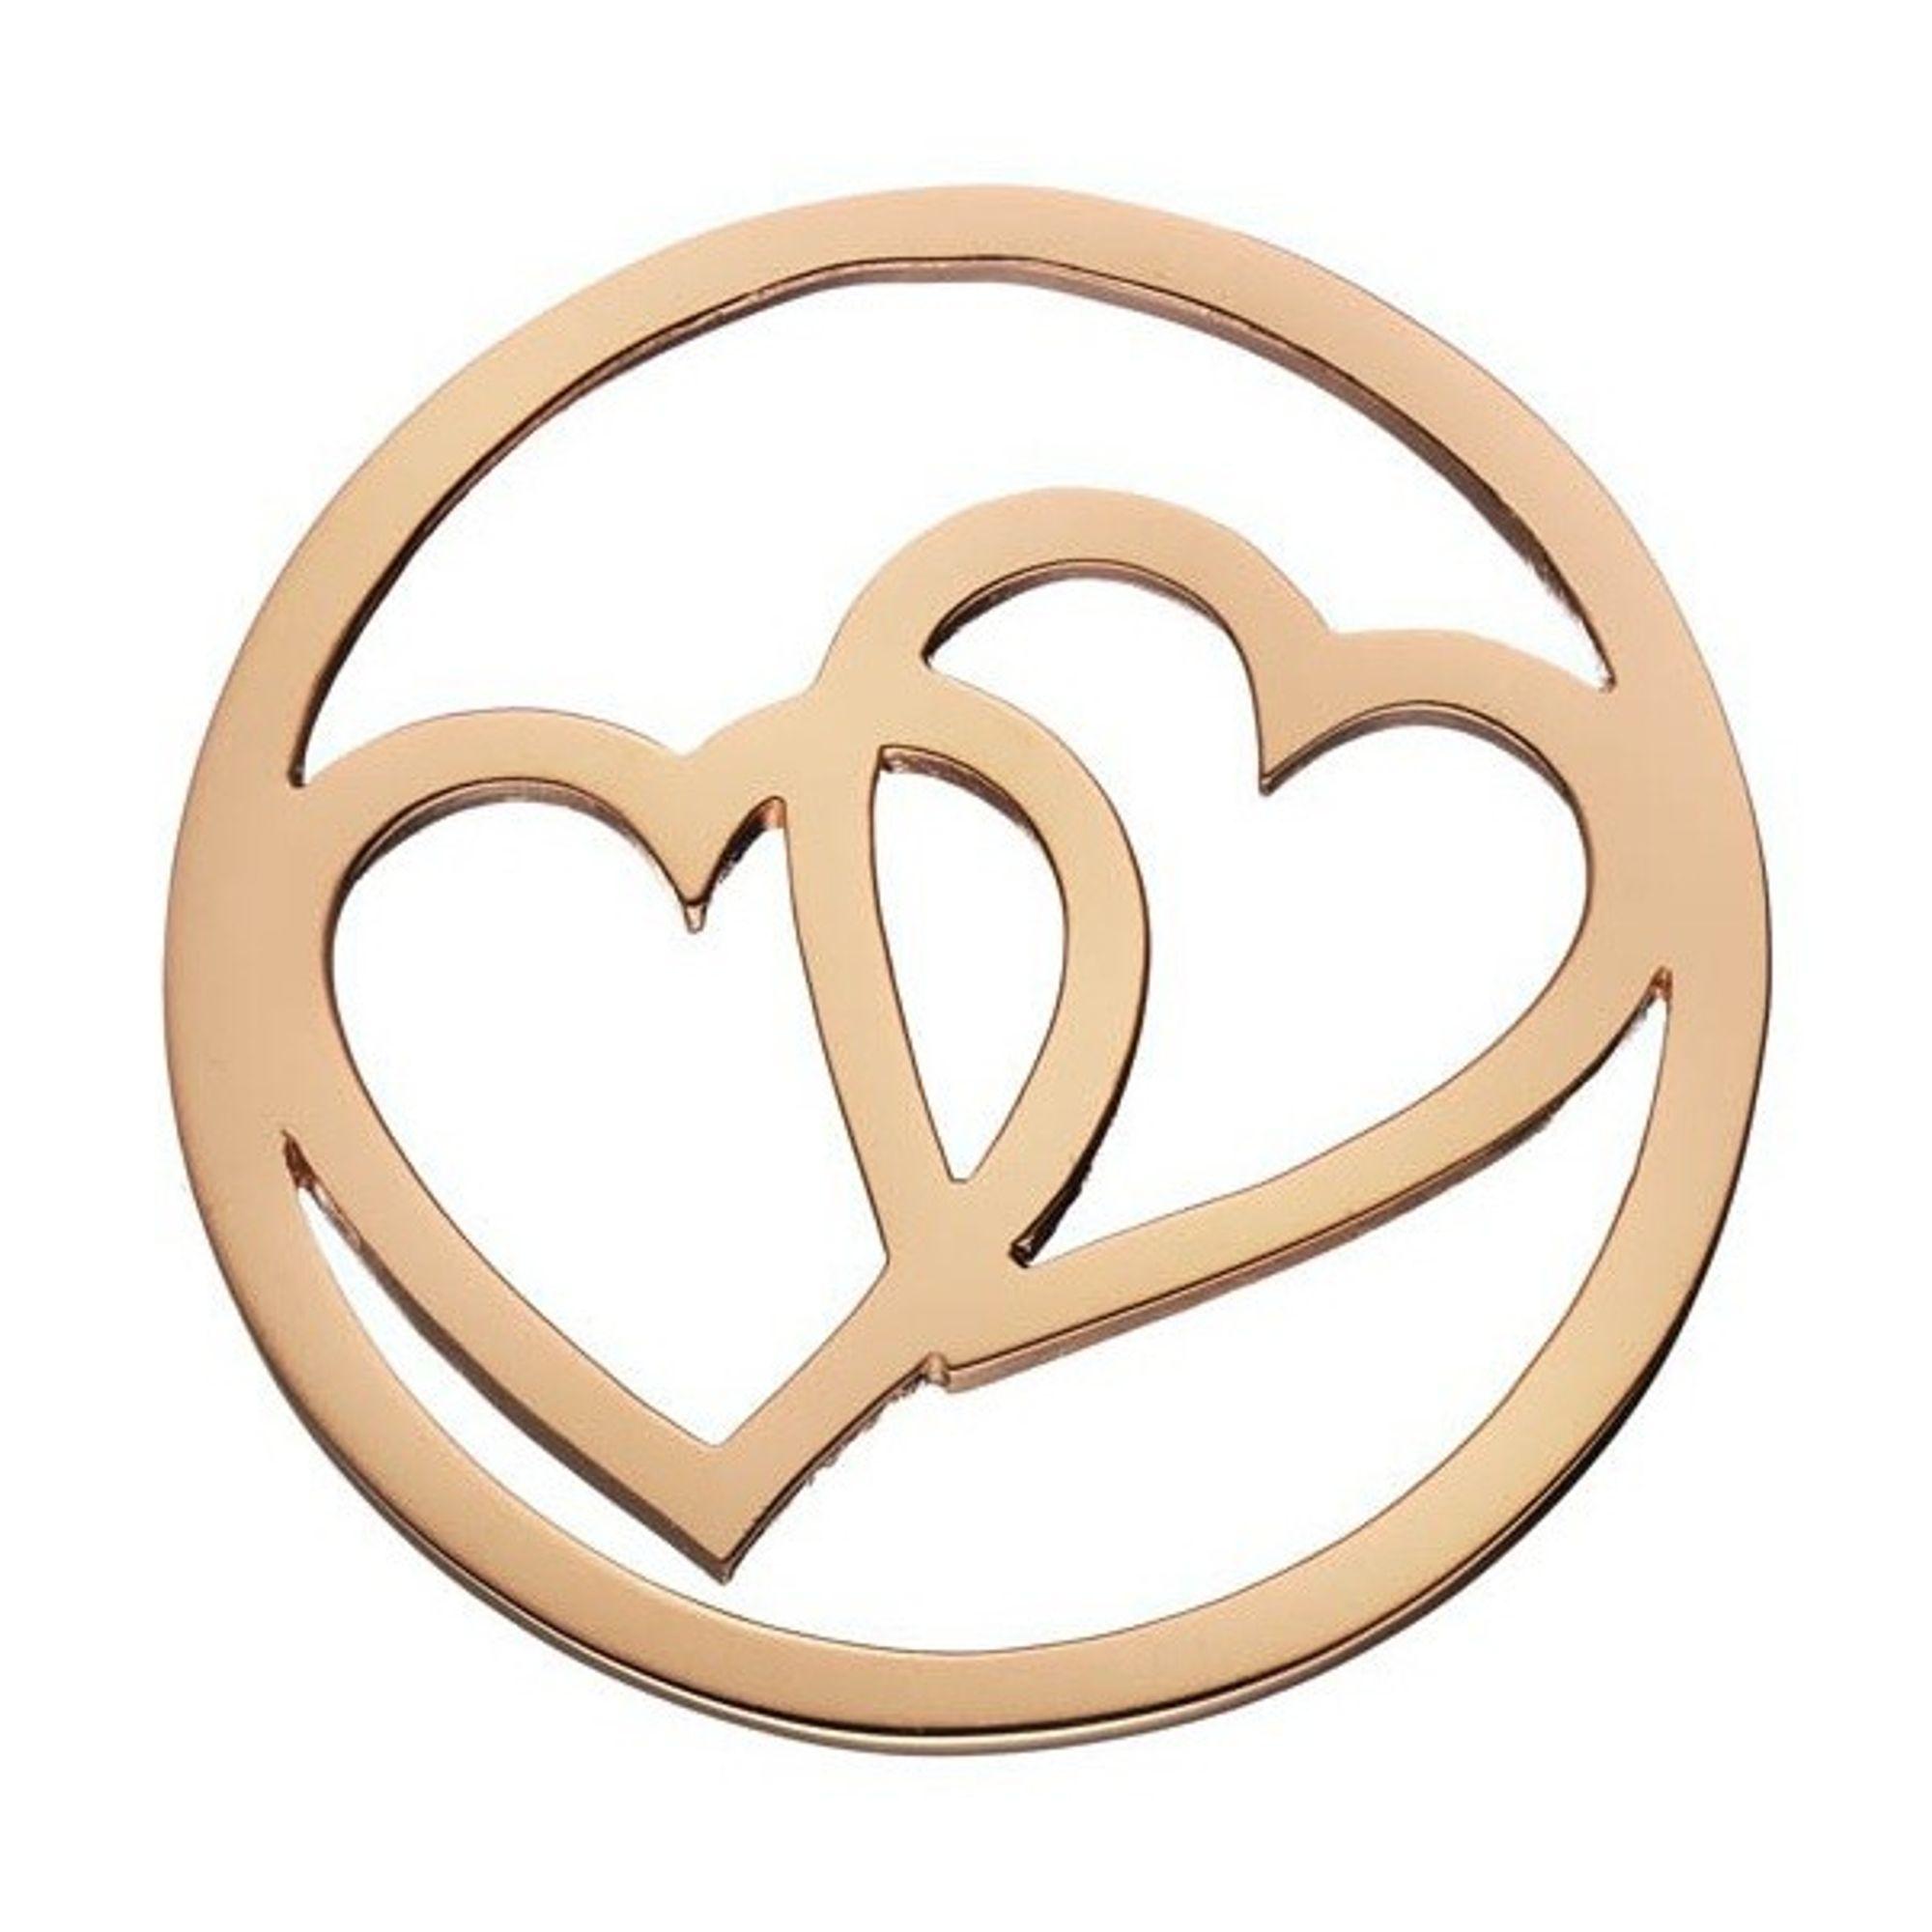 DAISY London HC1004 Münze Platte Herz Double Heart Halo rosé